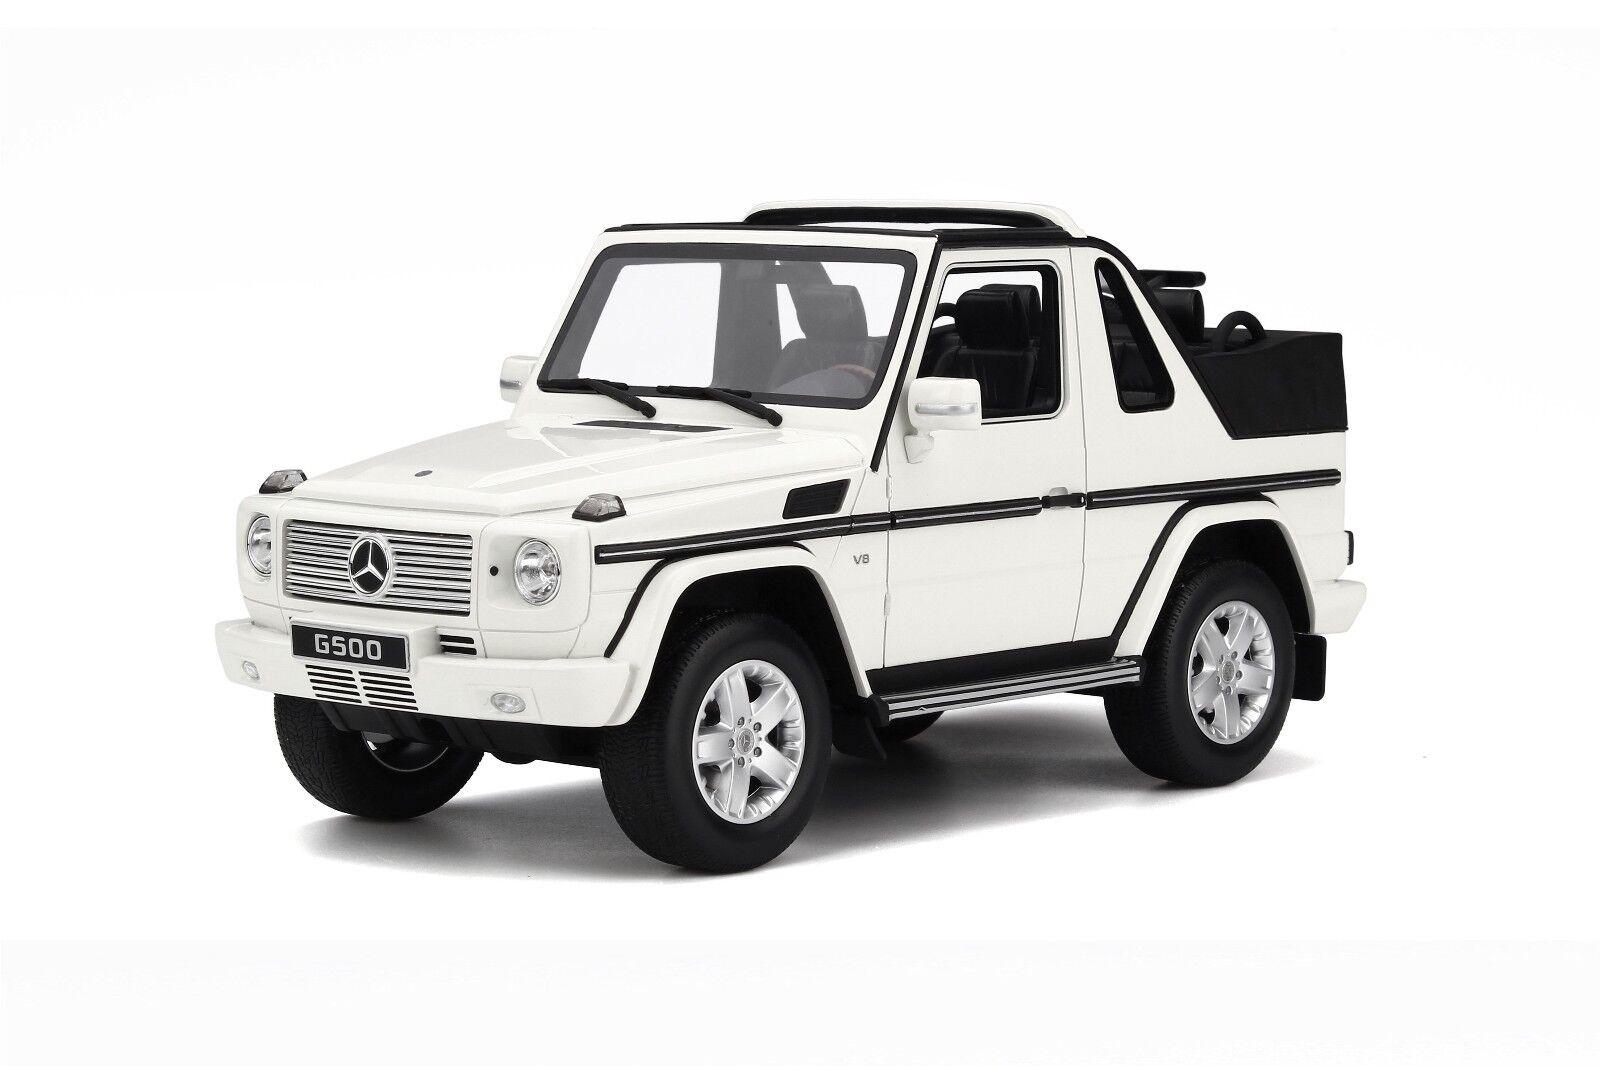 Mercedes Benz G Cabriolet, Ottomobile OT275 1 18th scale